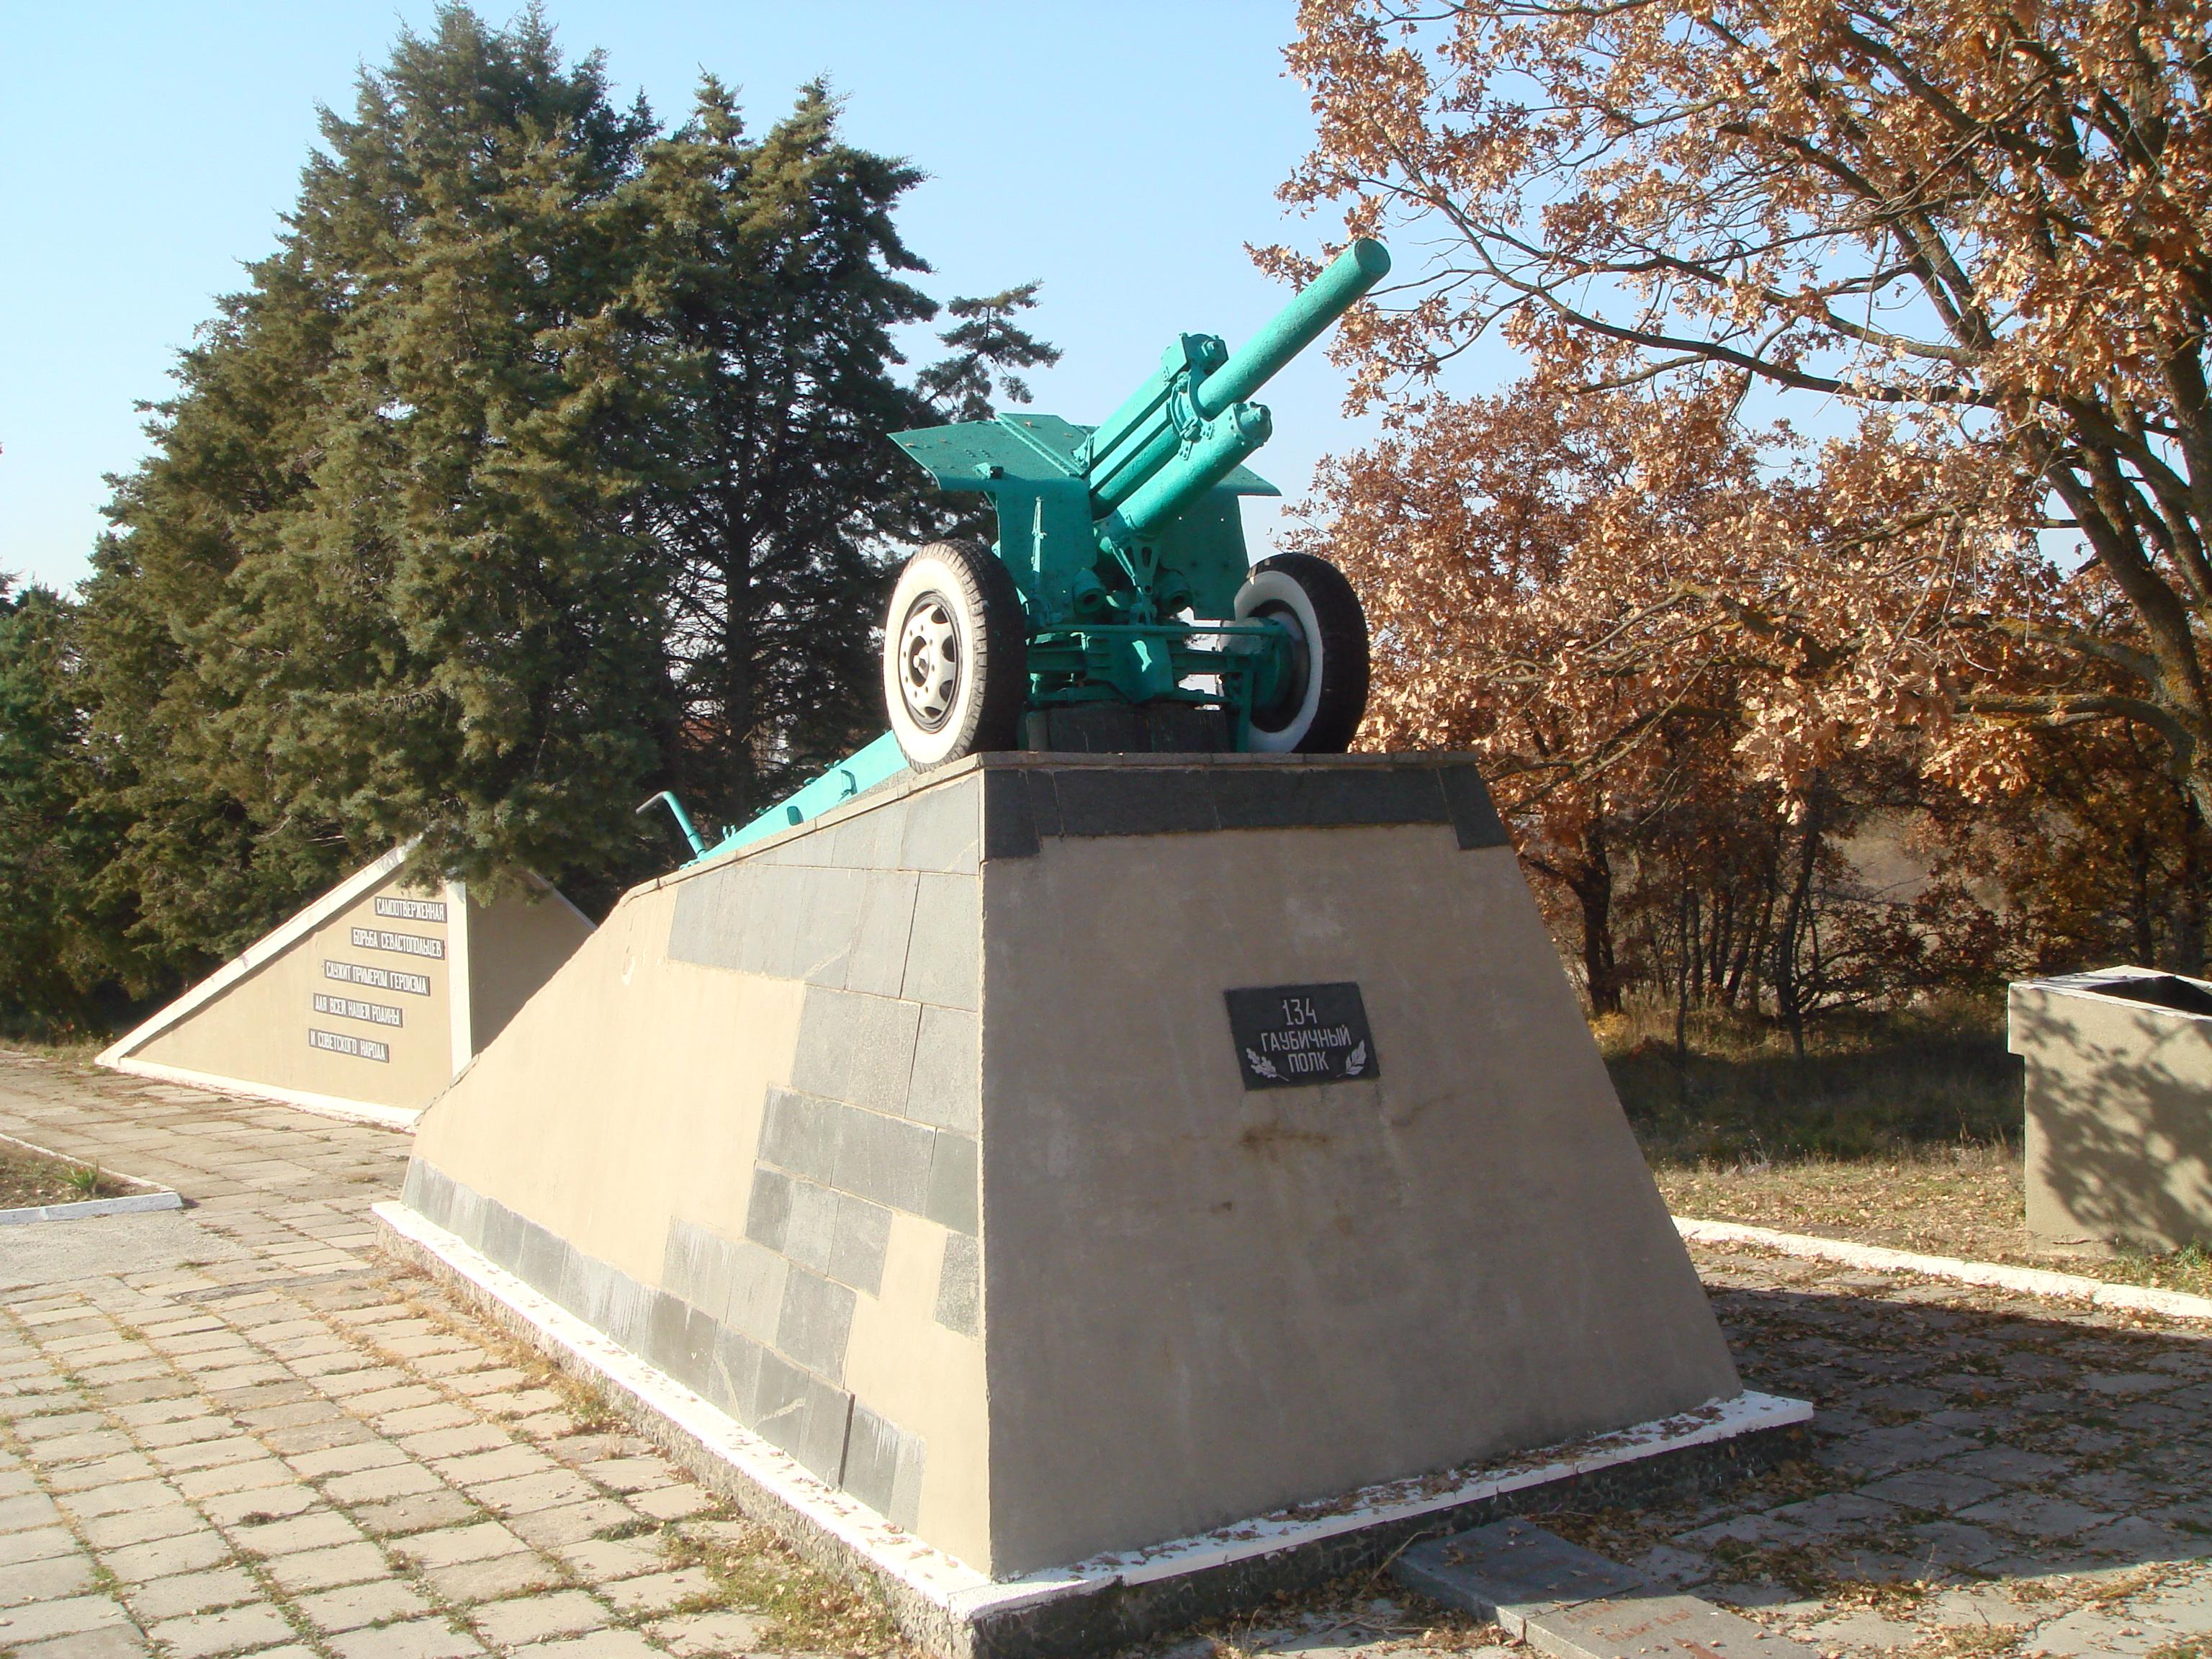 Артиллерийское орудие - 122-мм гаубица